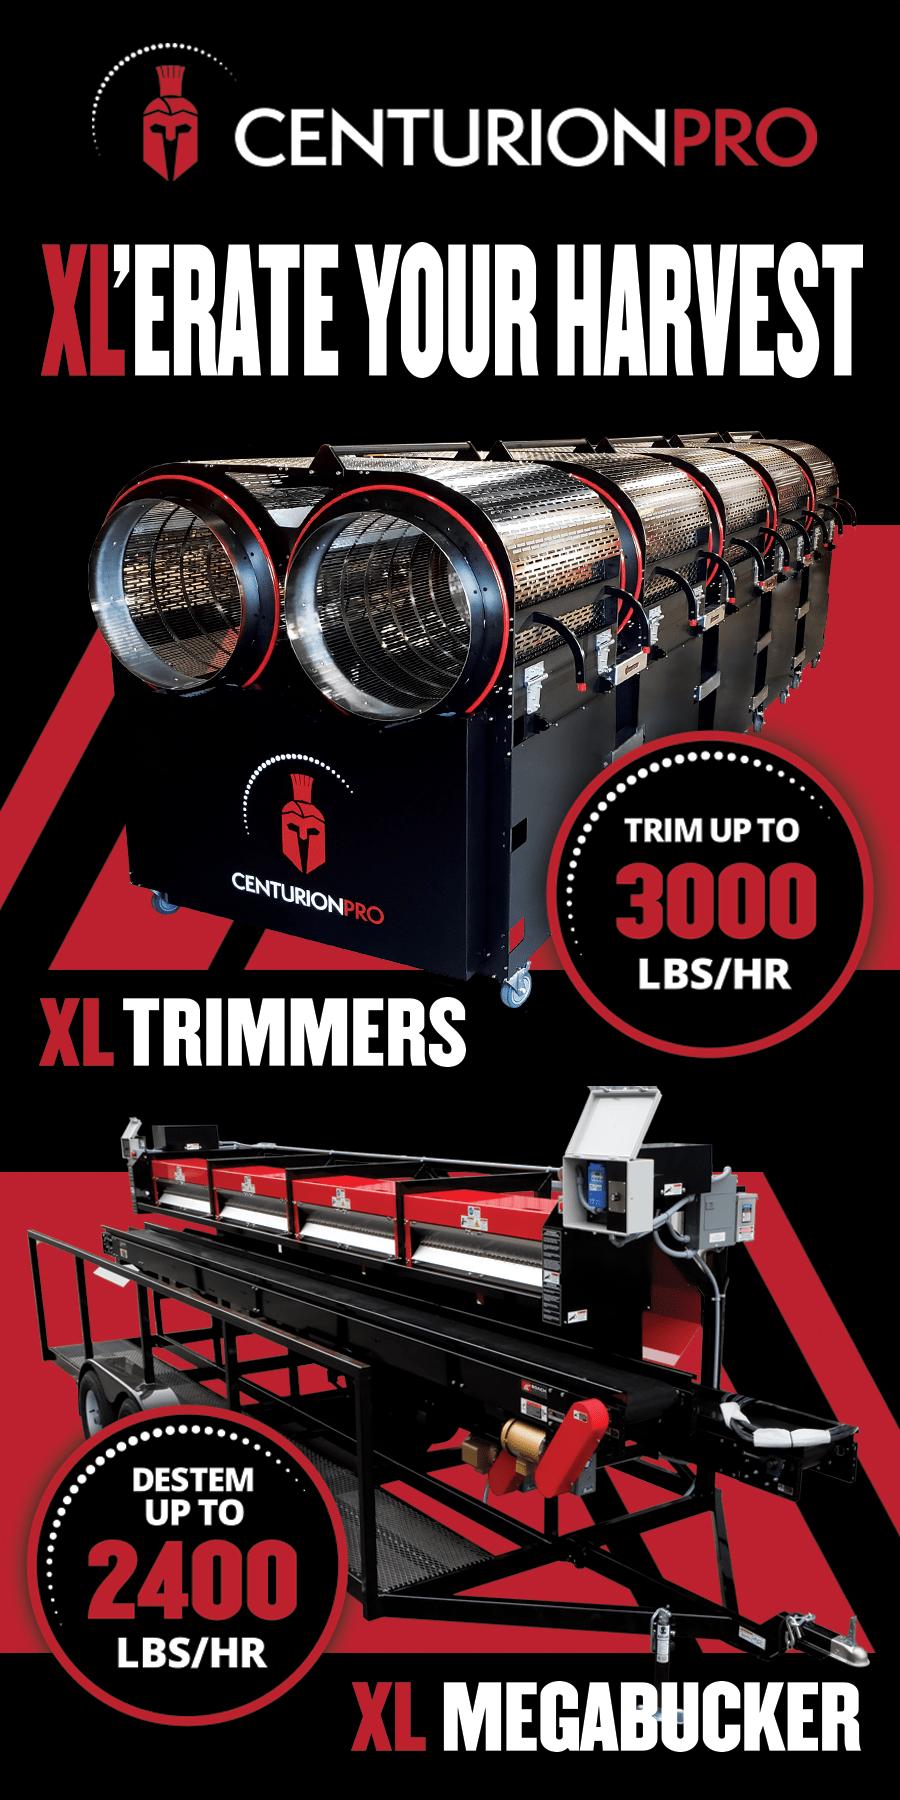 900x1800px_XL_Banner_Trimleaf